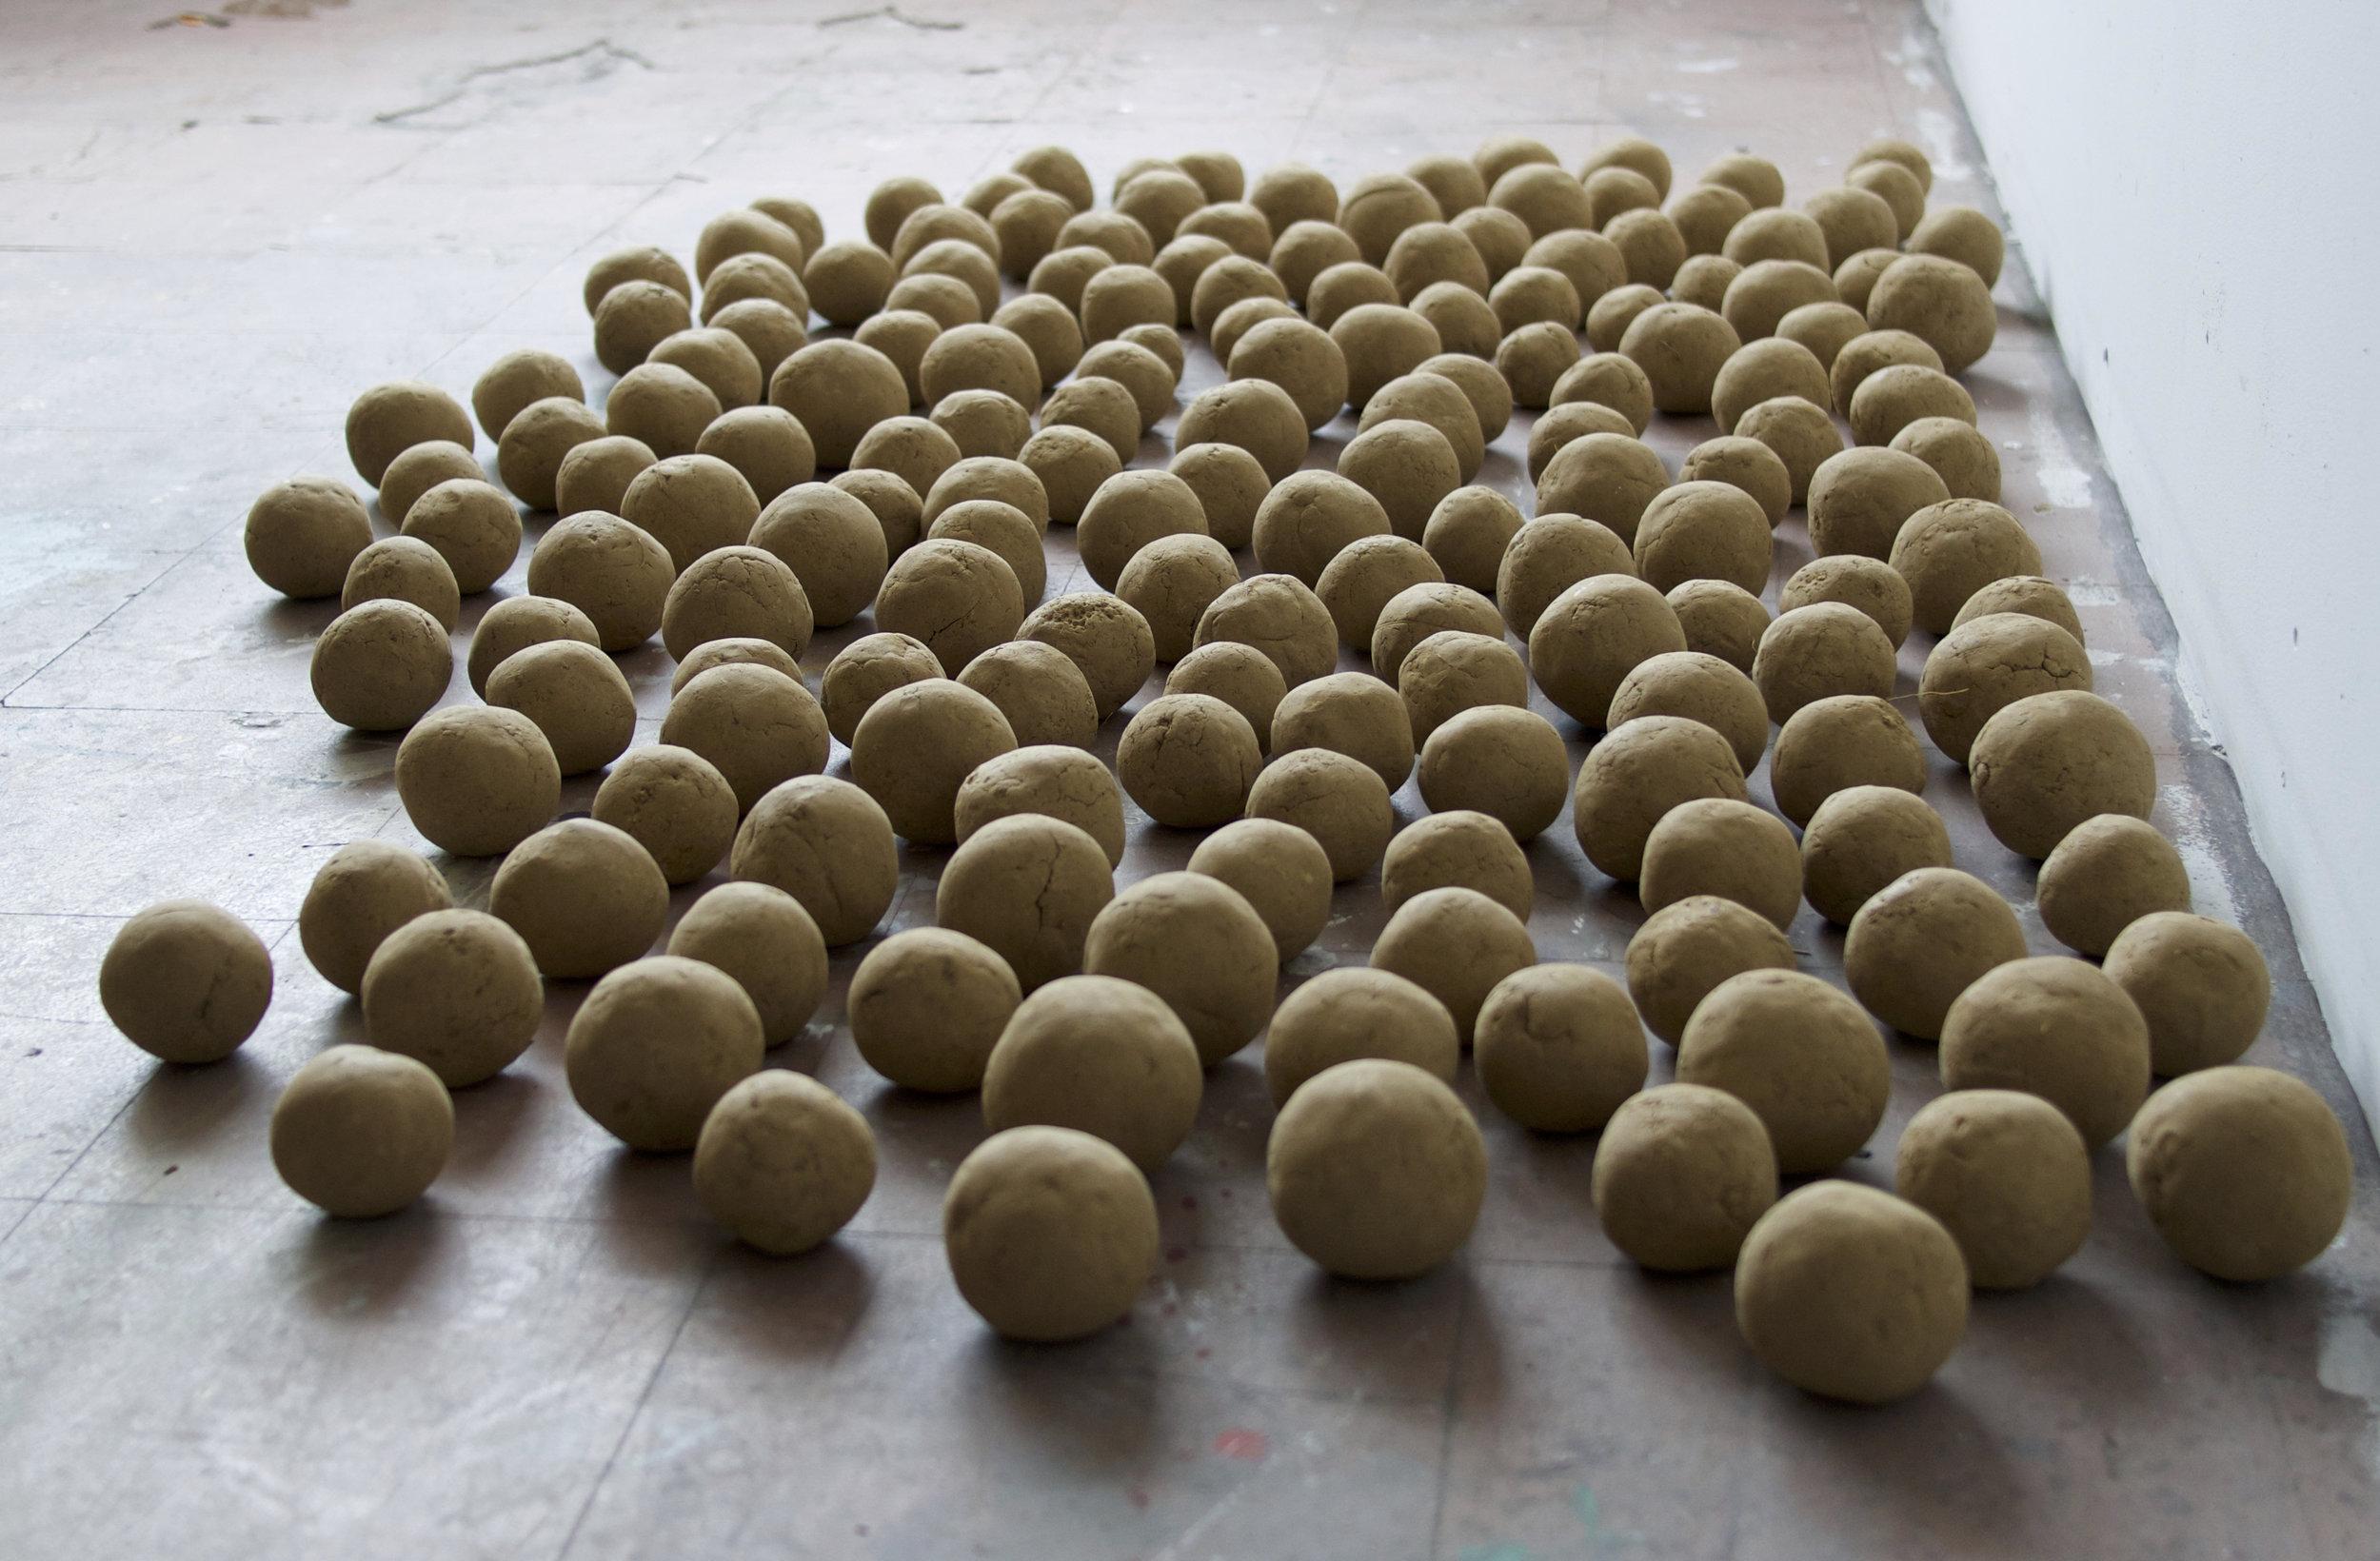 "Self-portrait, 171 Dirt Balls  Each ball 3"" - Assembled dimensions vary  Dirt  (2015)"